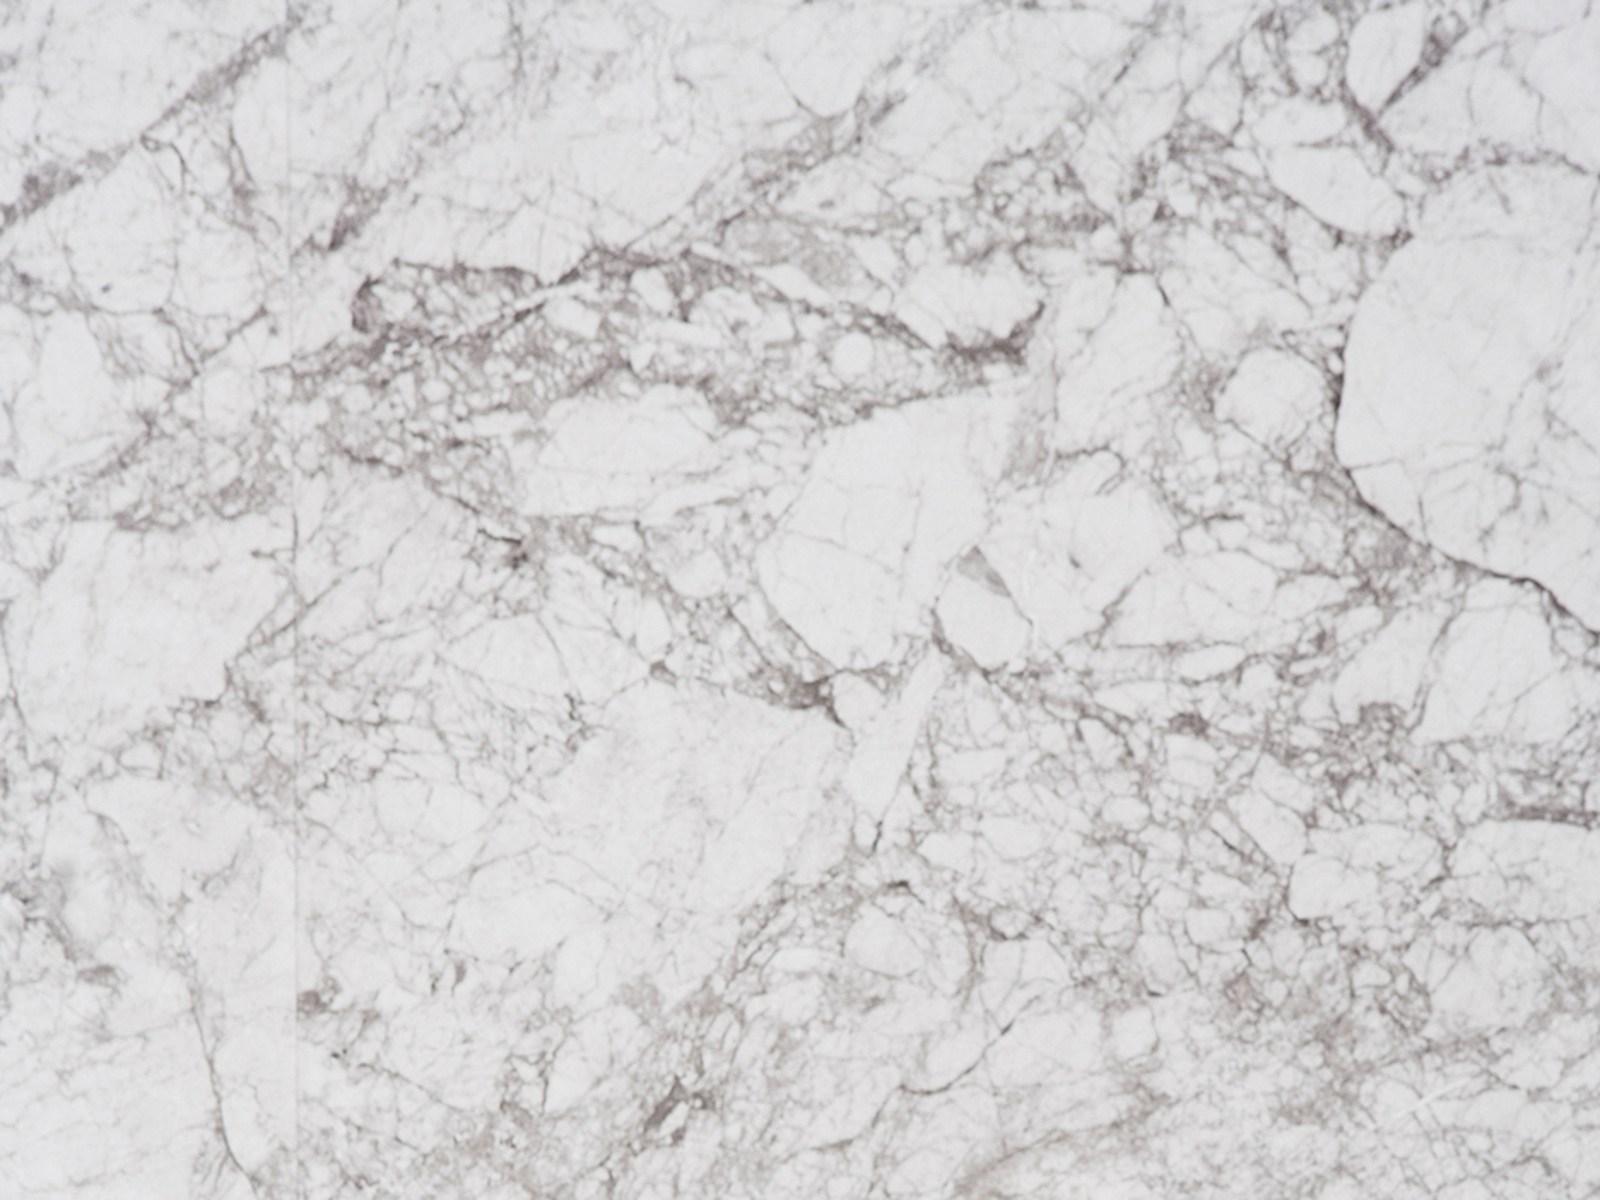 Marbleized Wallpaper Wallpapersafari